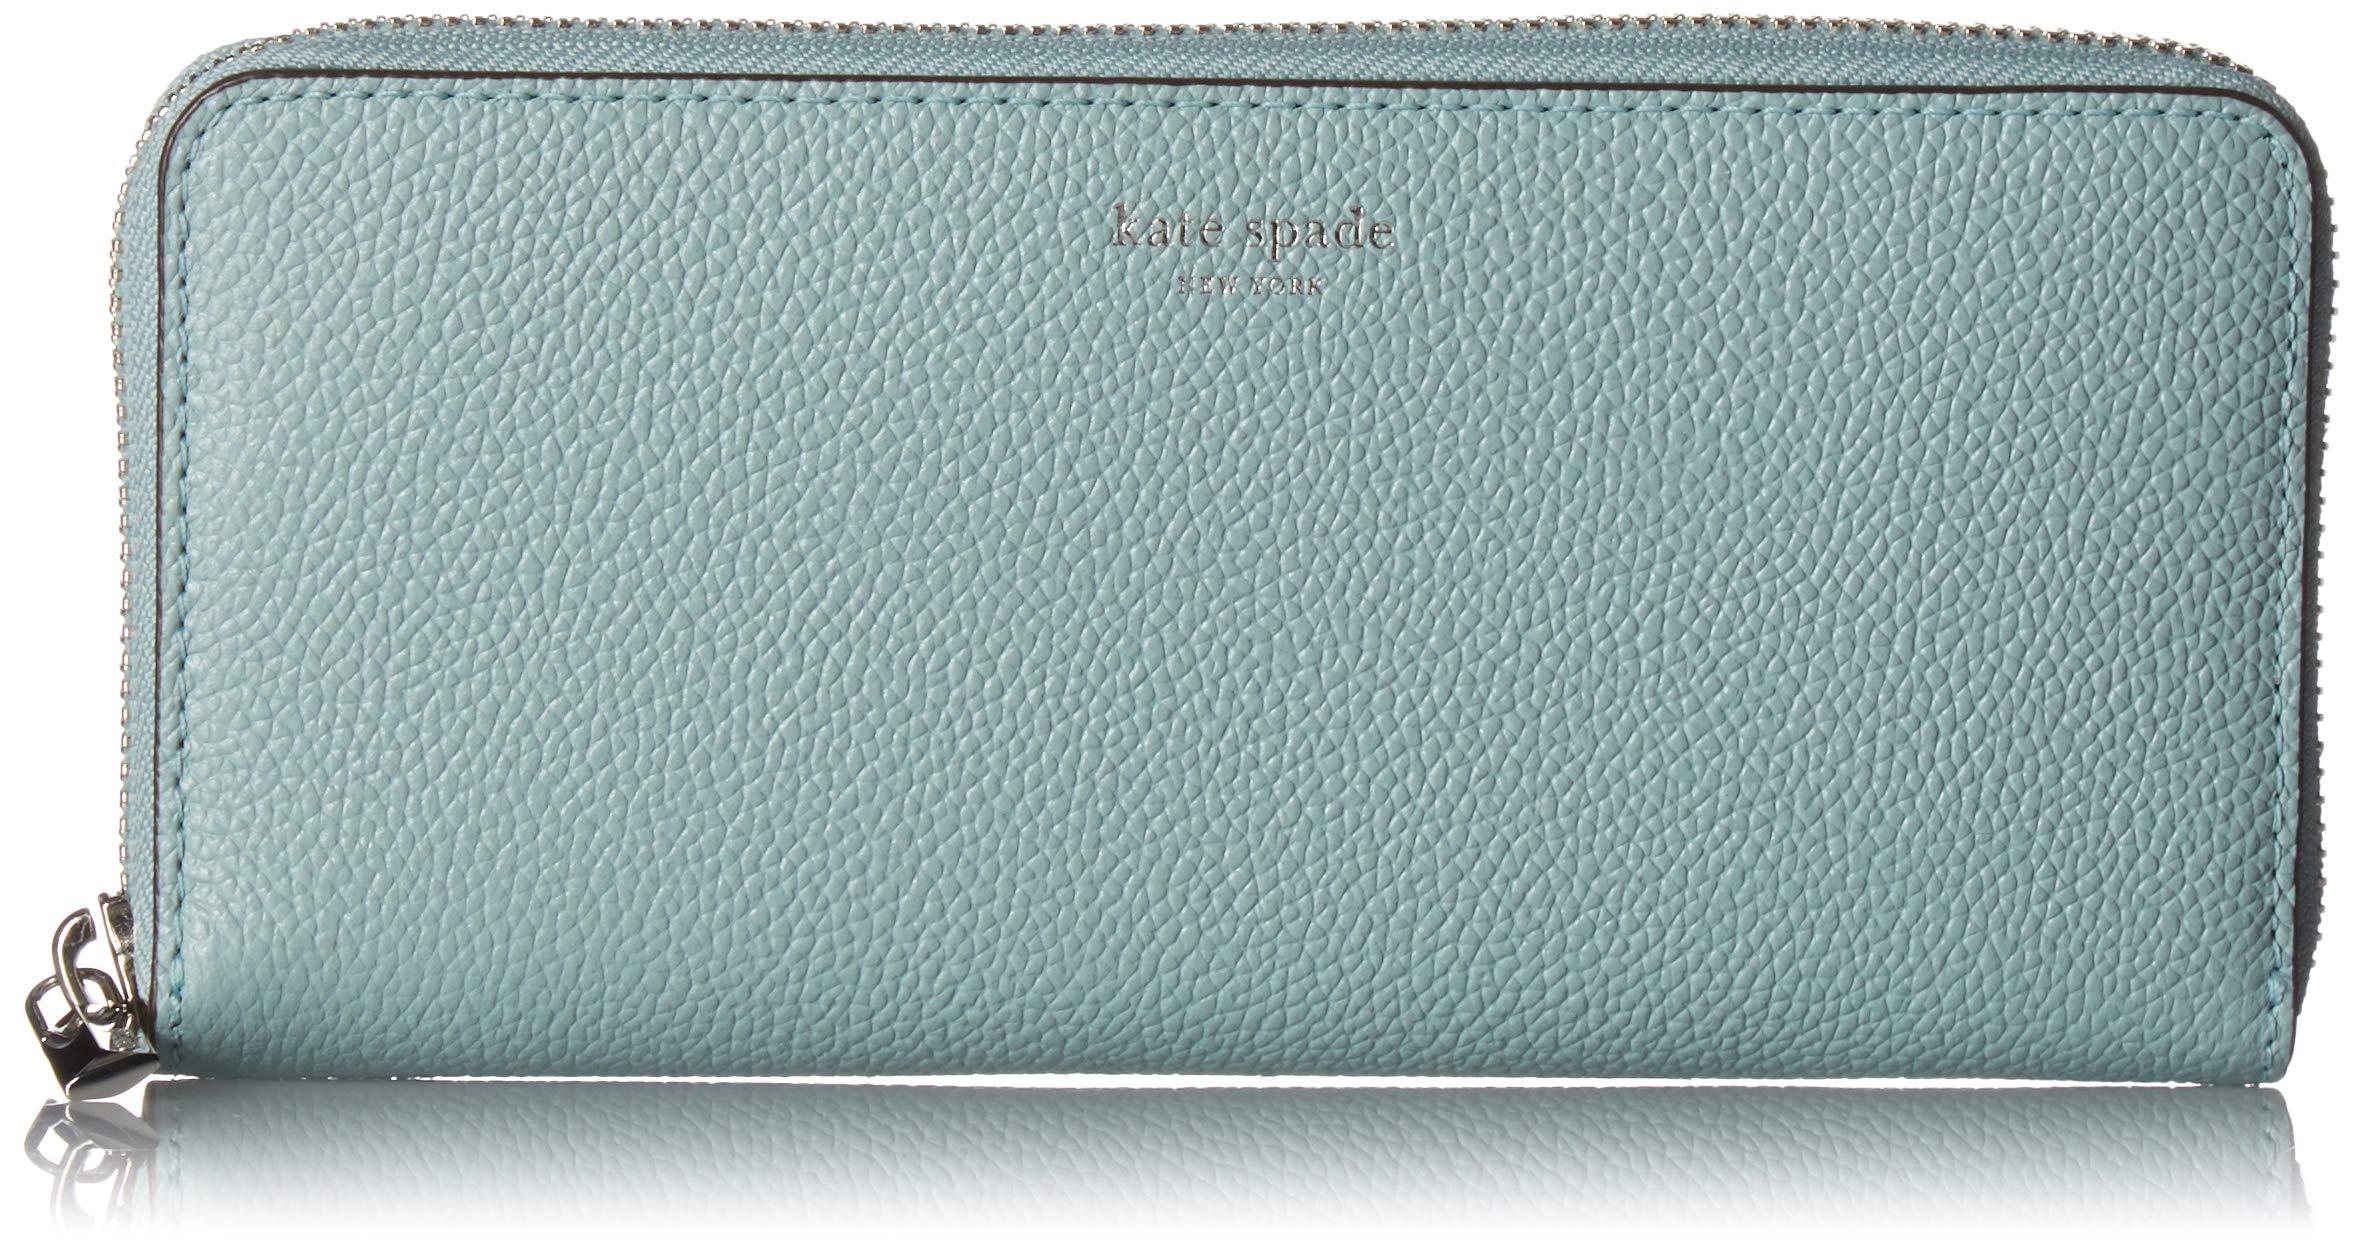 Kate Spade New York Women's Margaux Slim Continental Wallet Hazy One Size